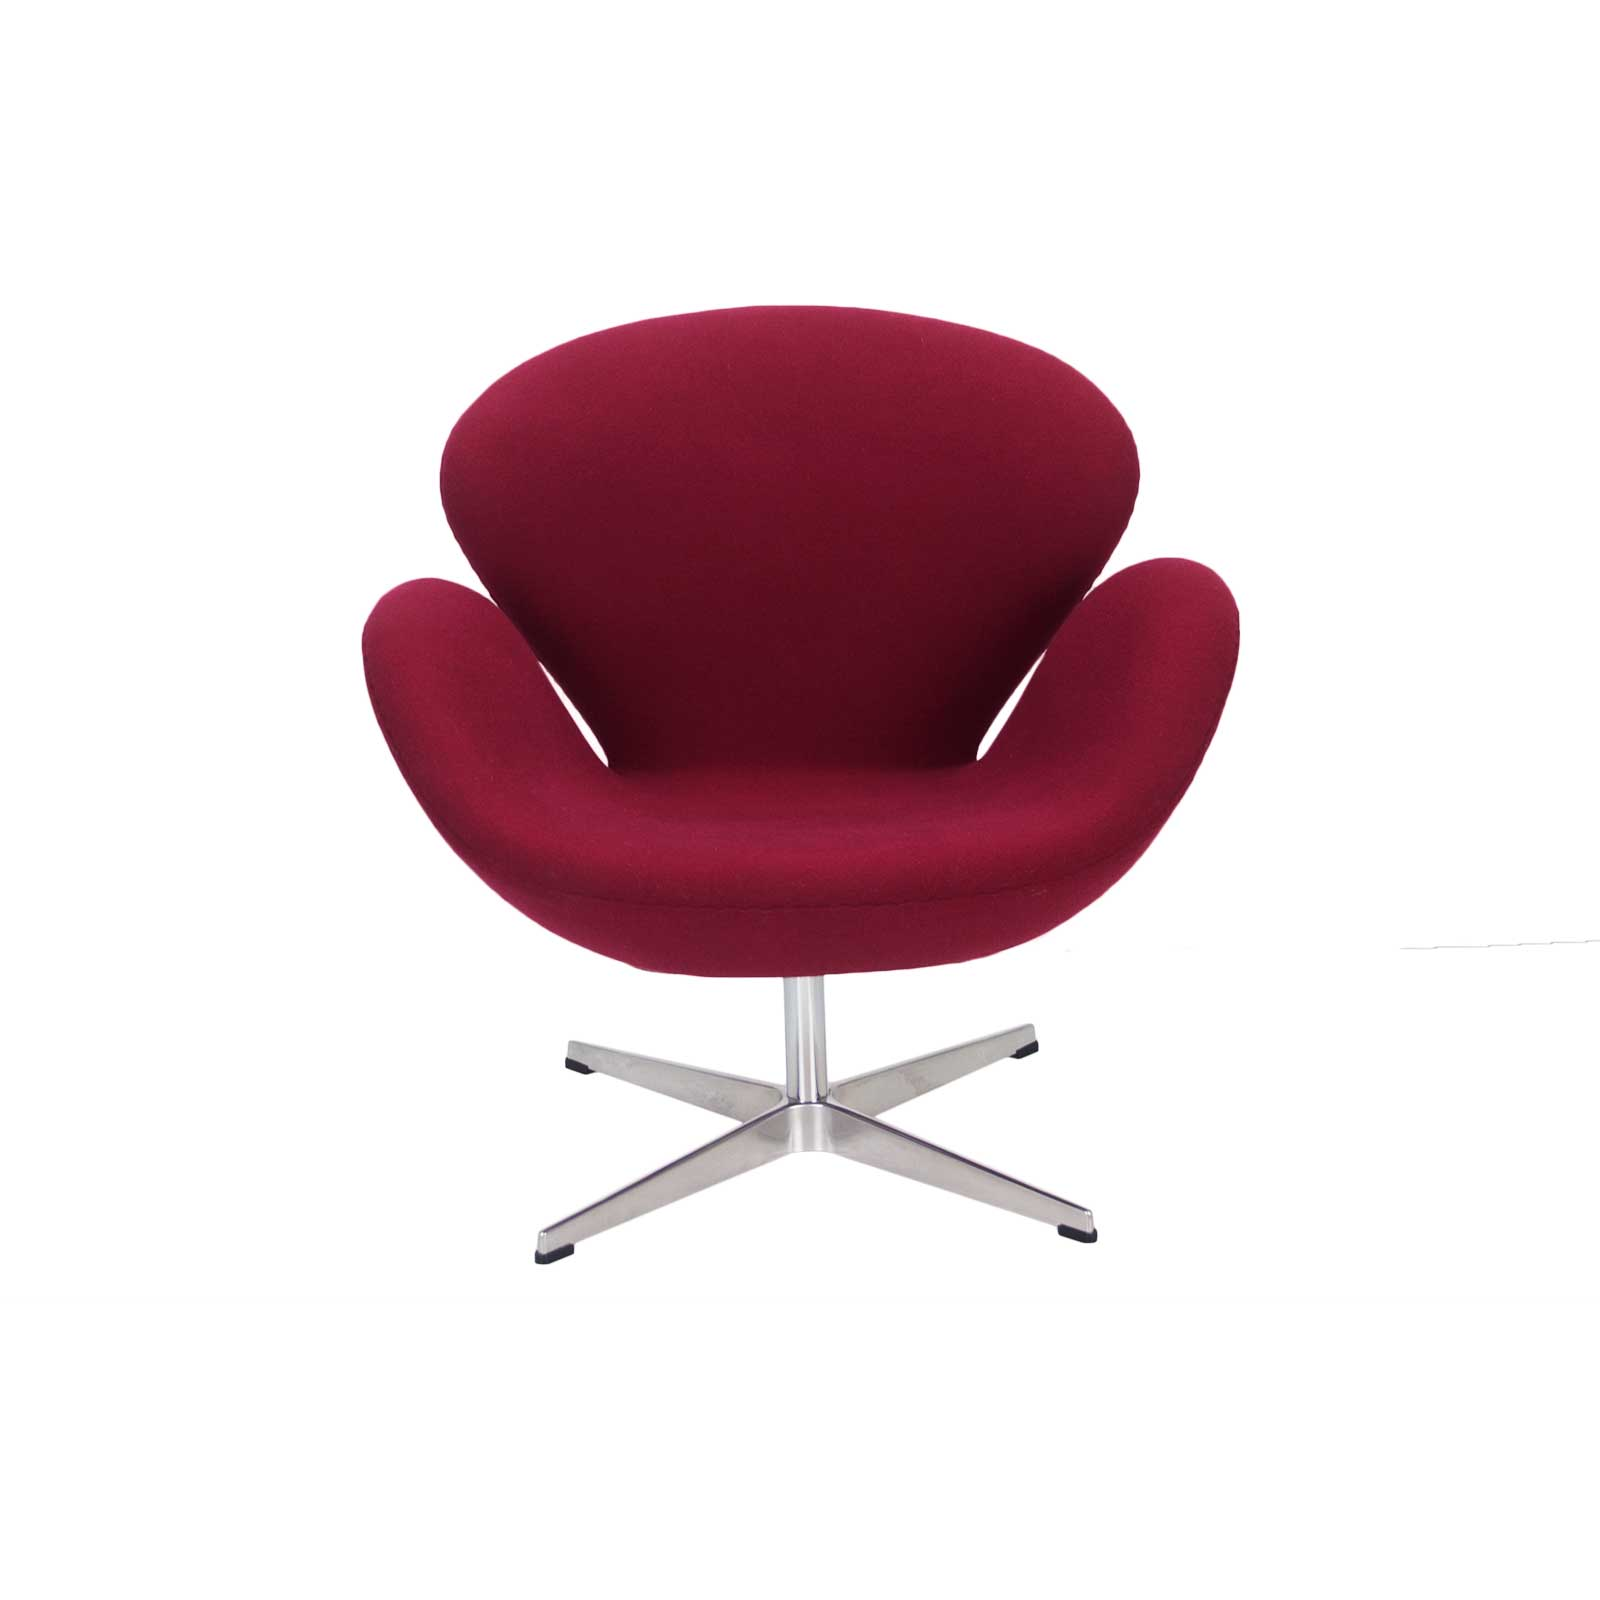 arne jacobsen swan chair used no plumbing pedicure burgundy formdecor